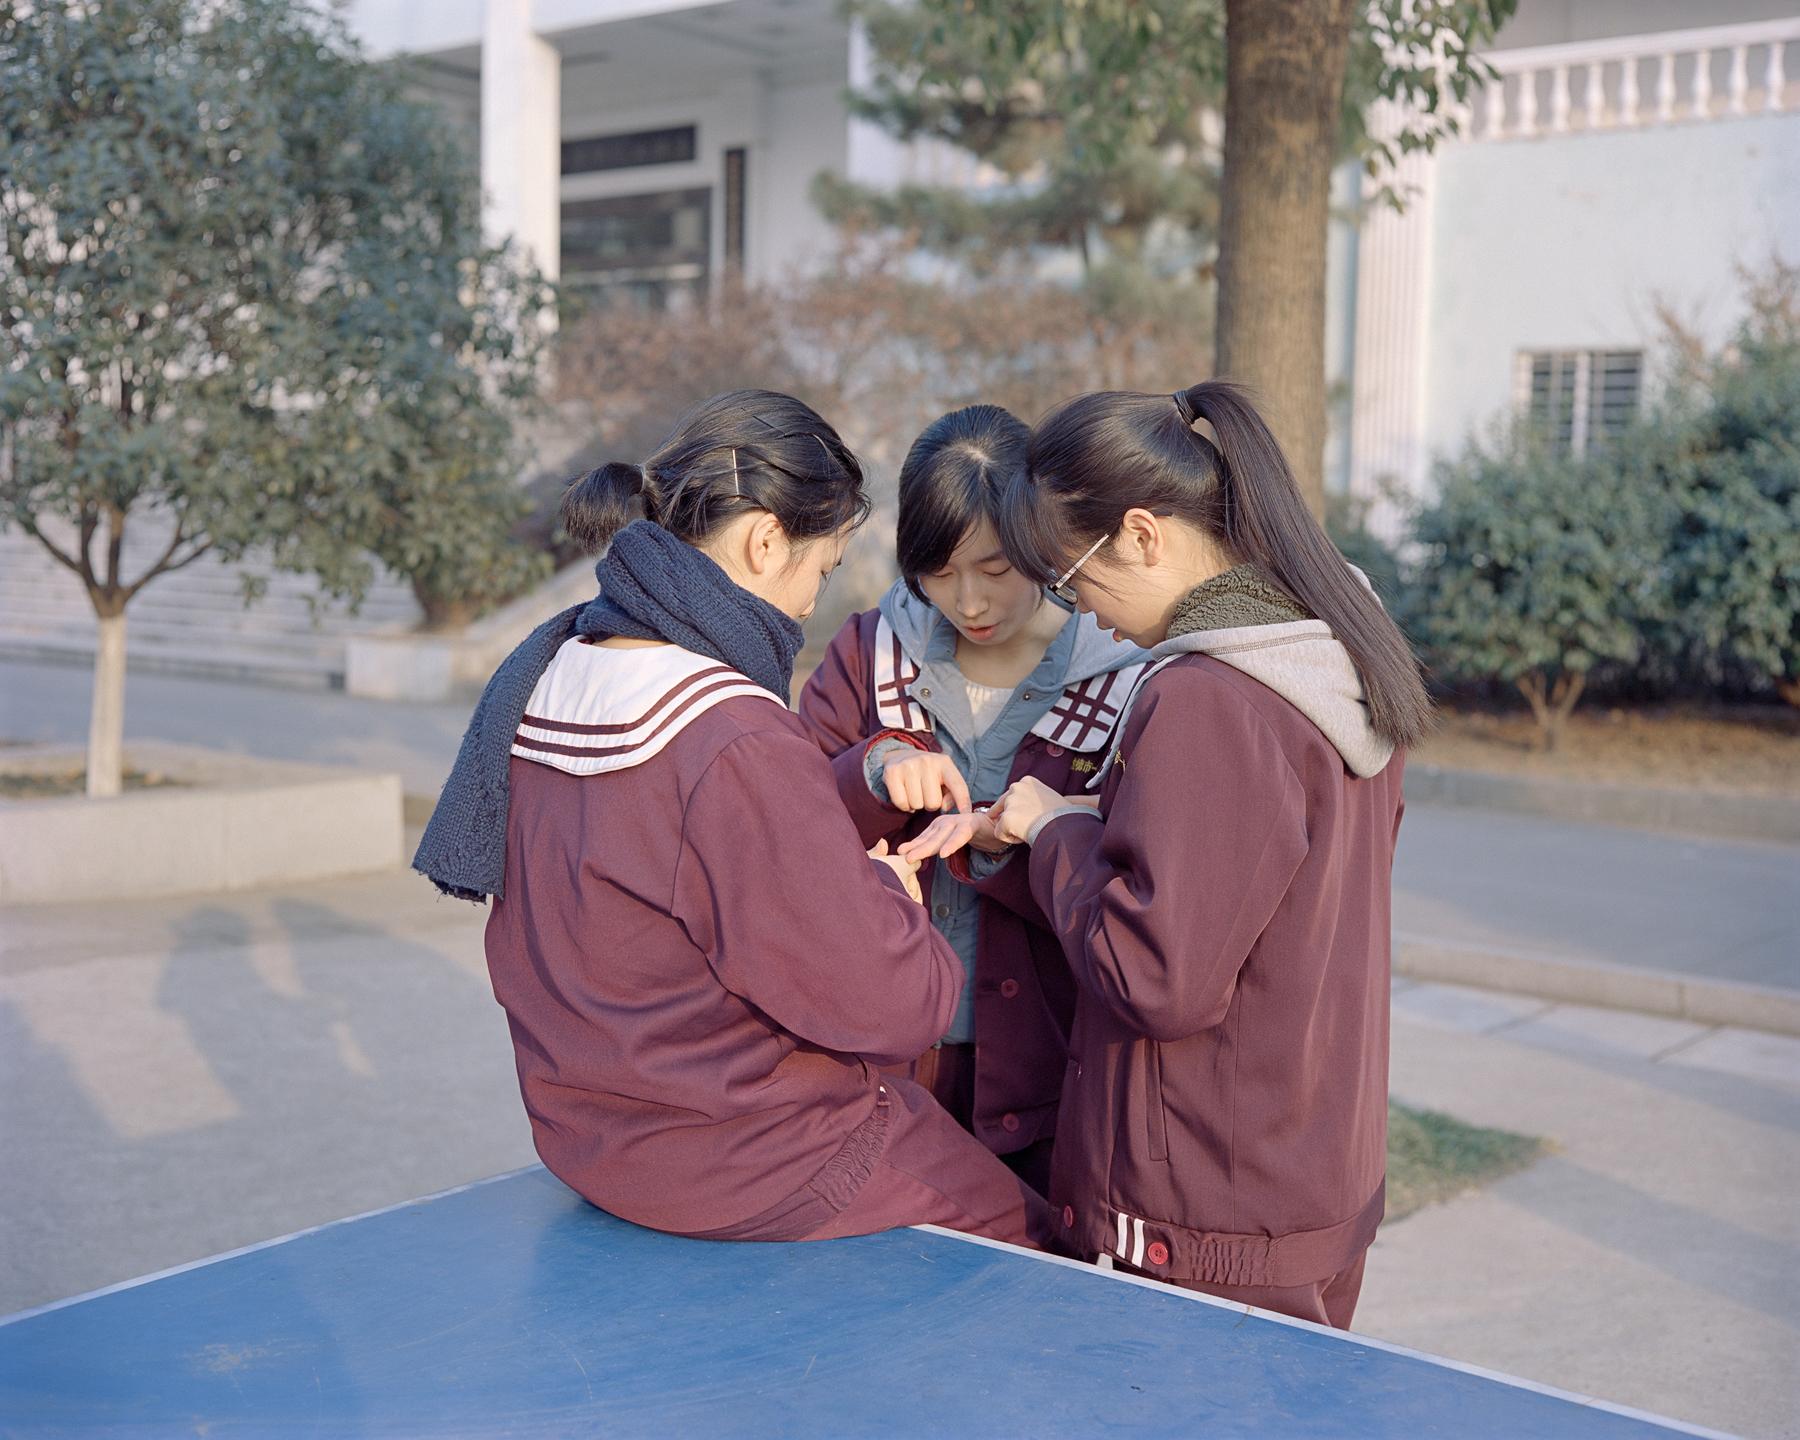 Changde, Hunan province, 2015.